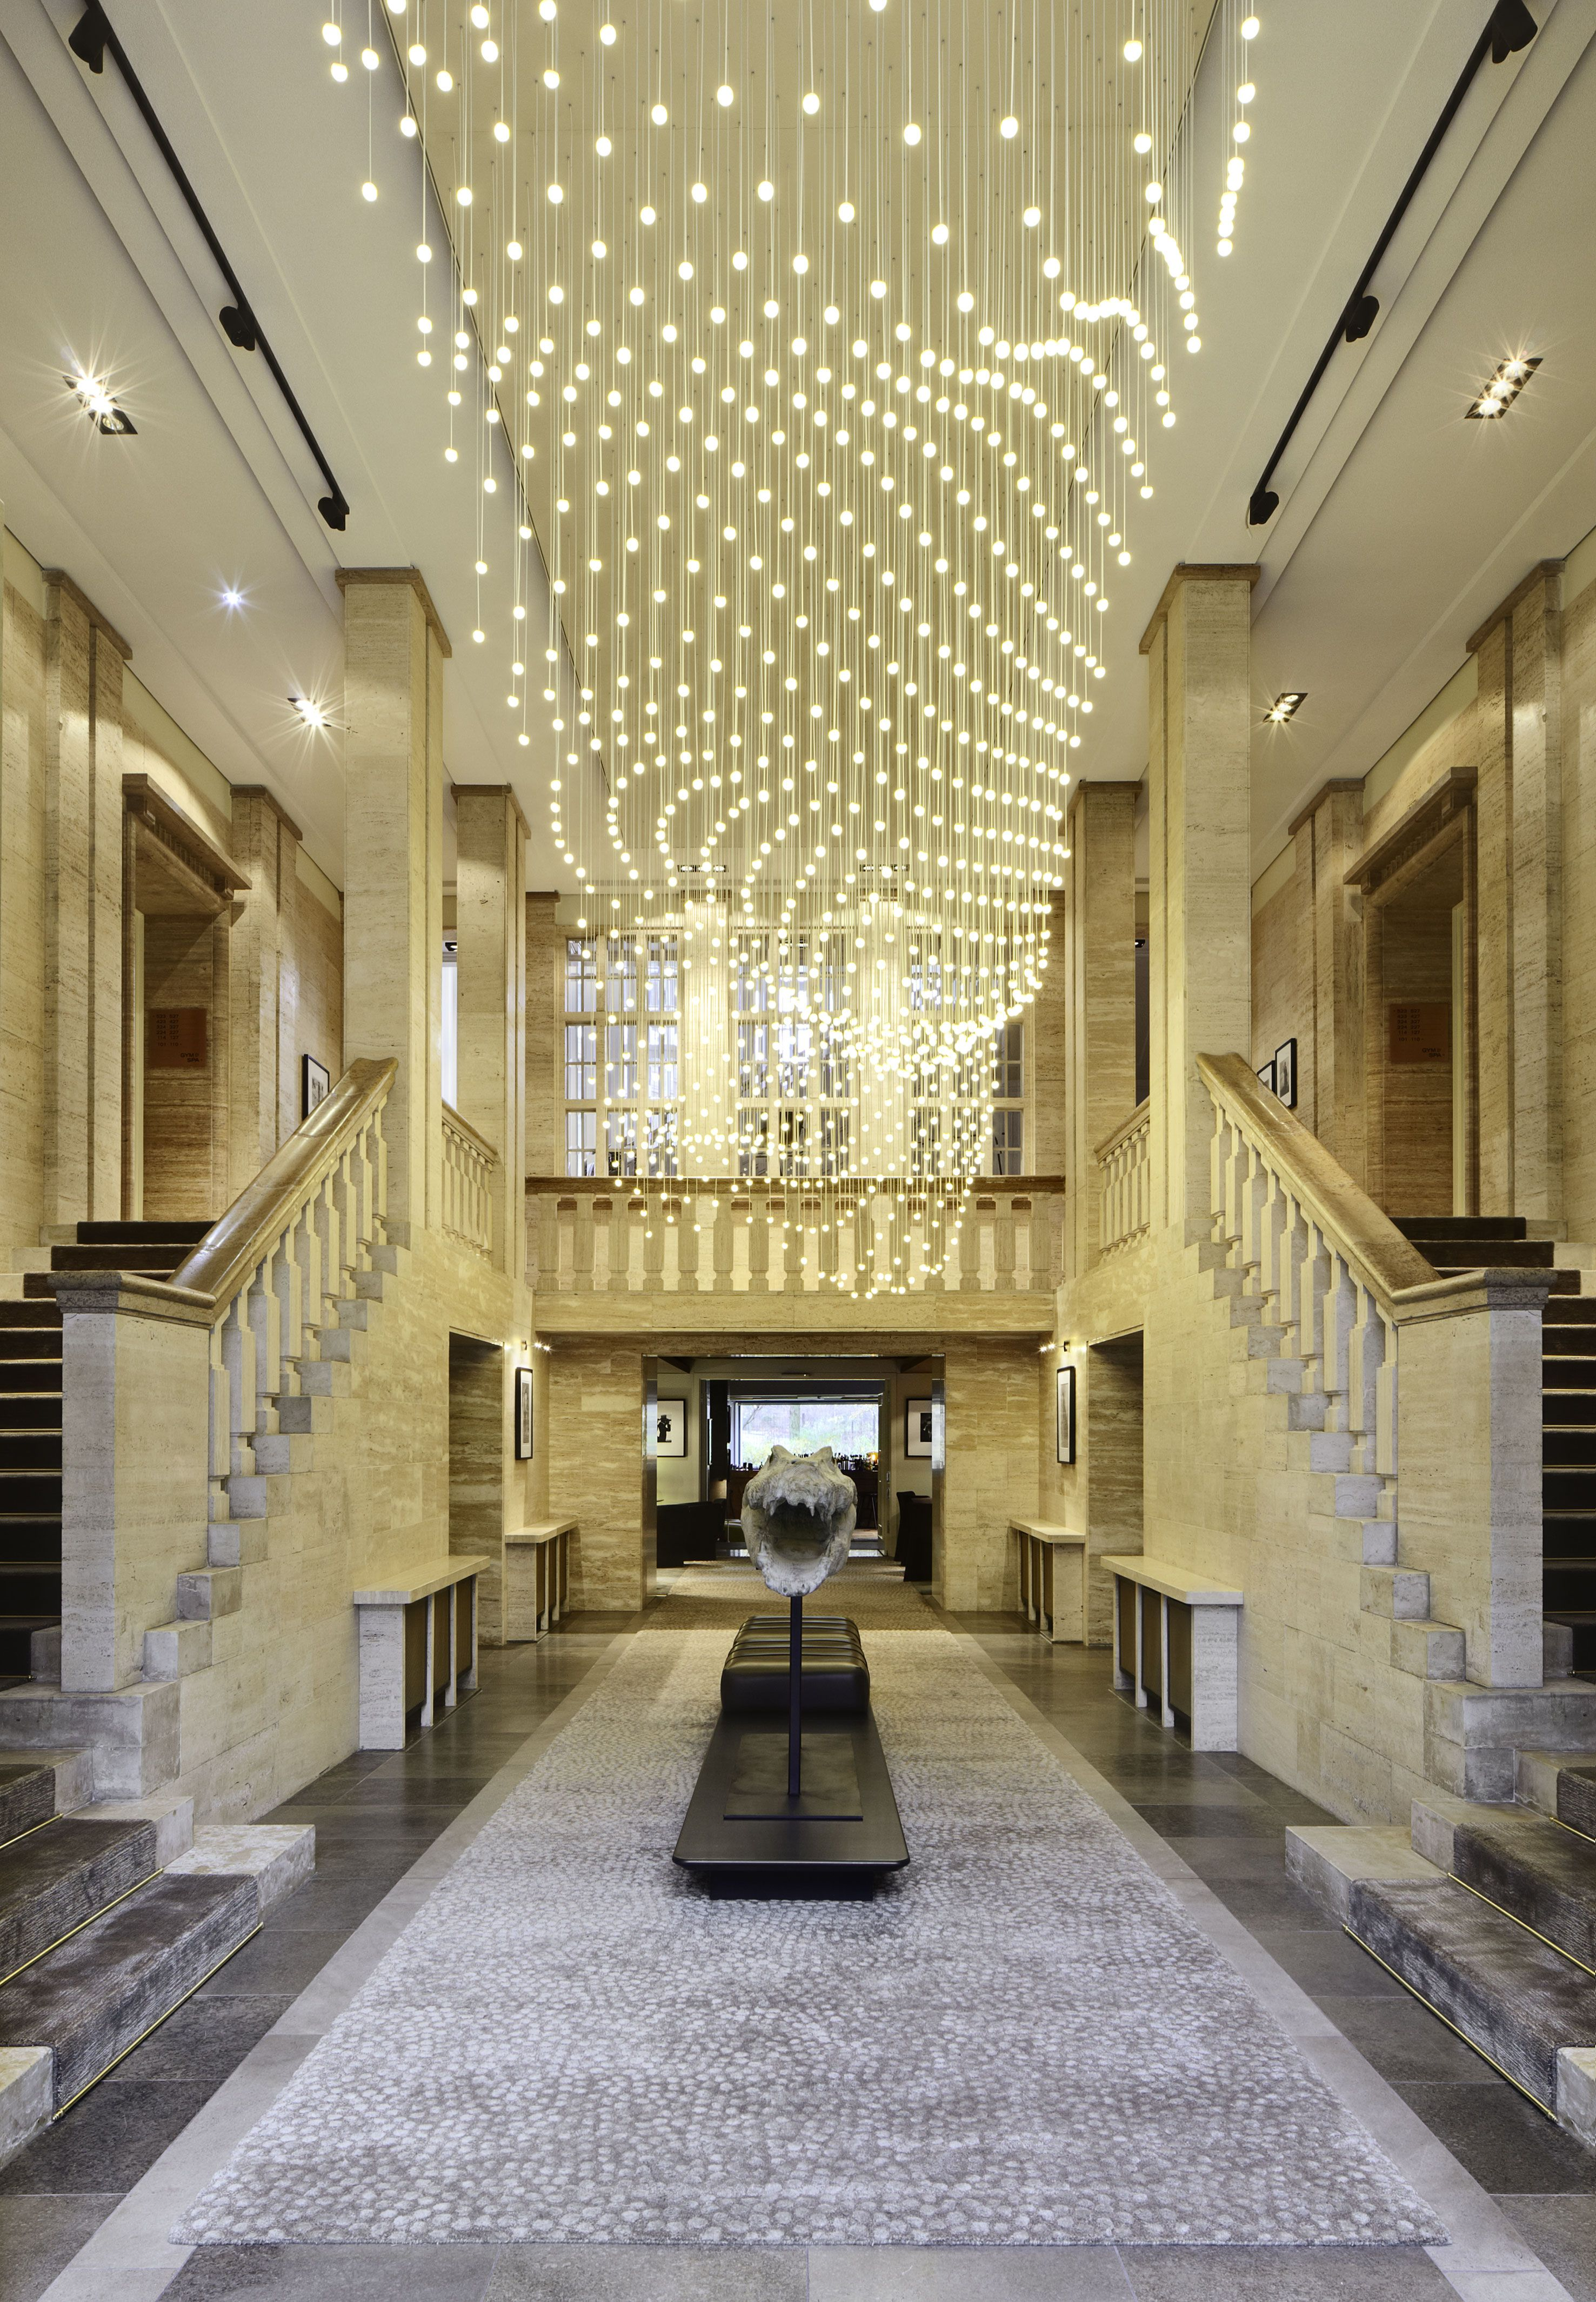 das stue hotel lobby berlin hotel interiors hotel